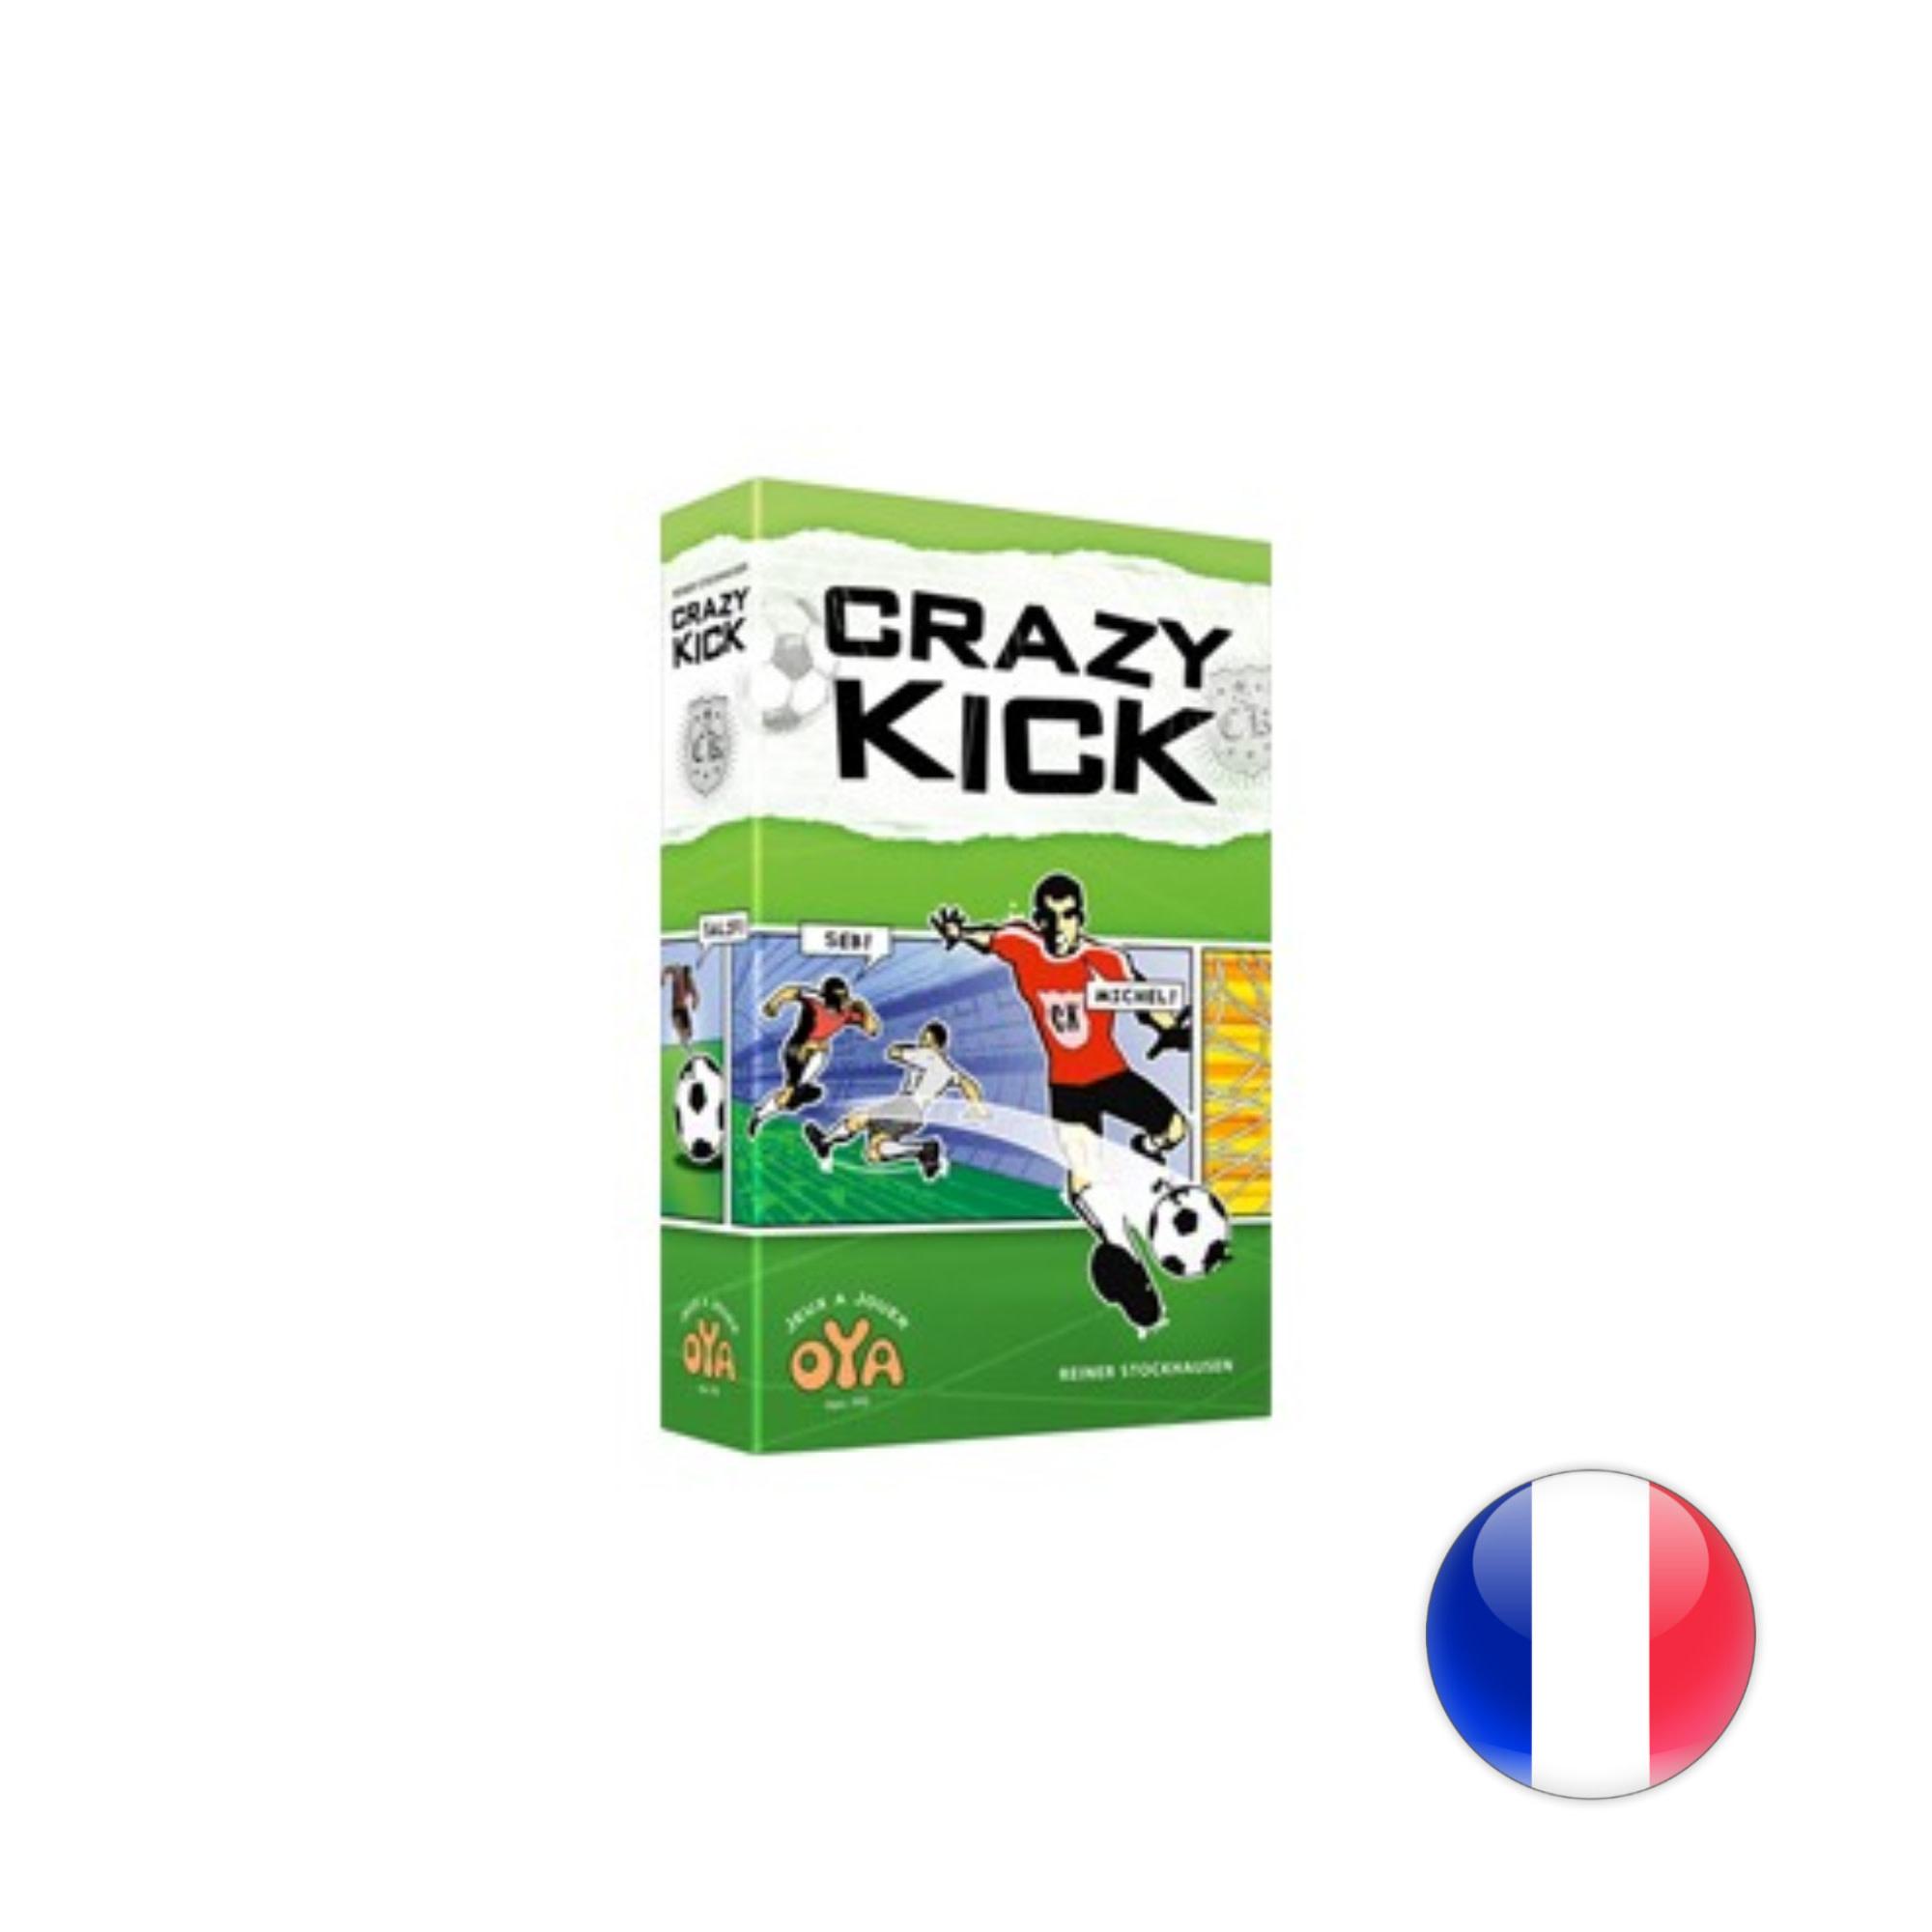 Oya Crazy Kick VF